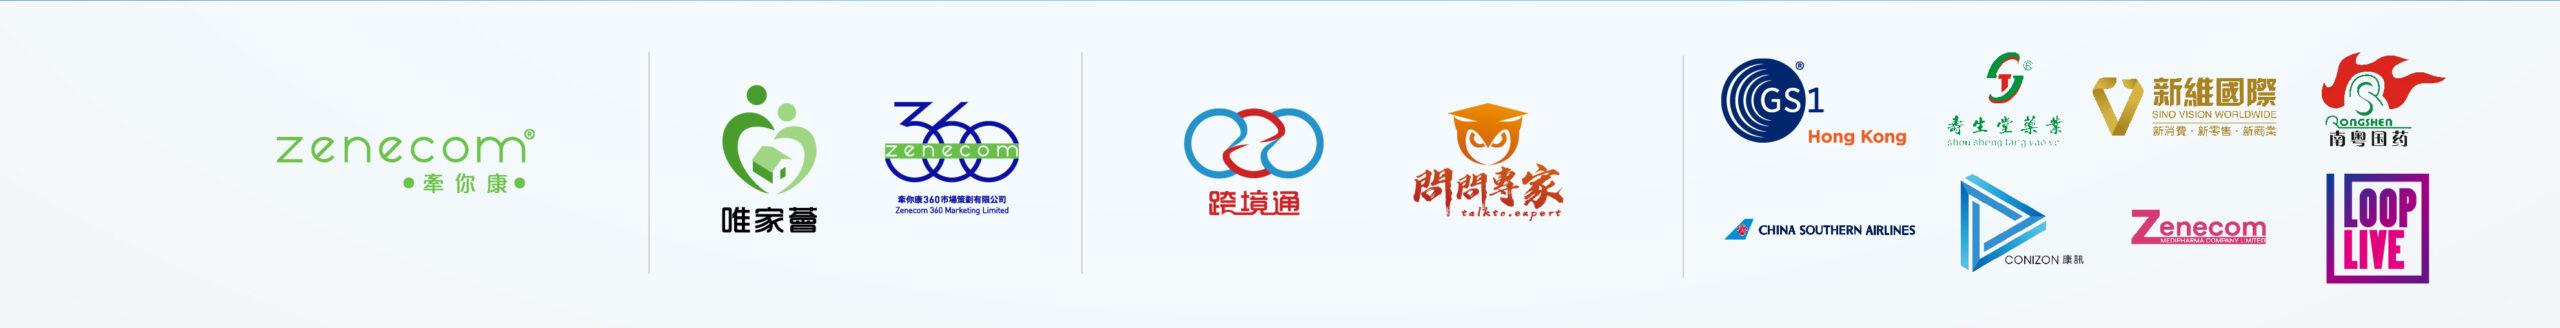 Zenecom business and partners